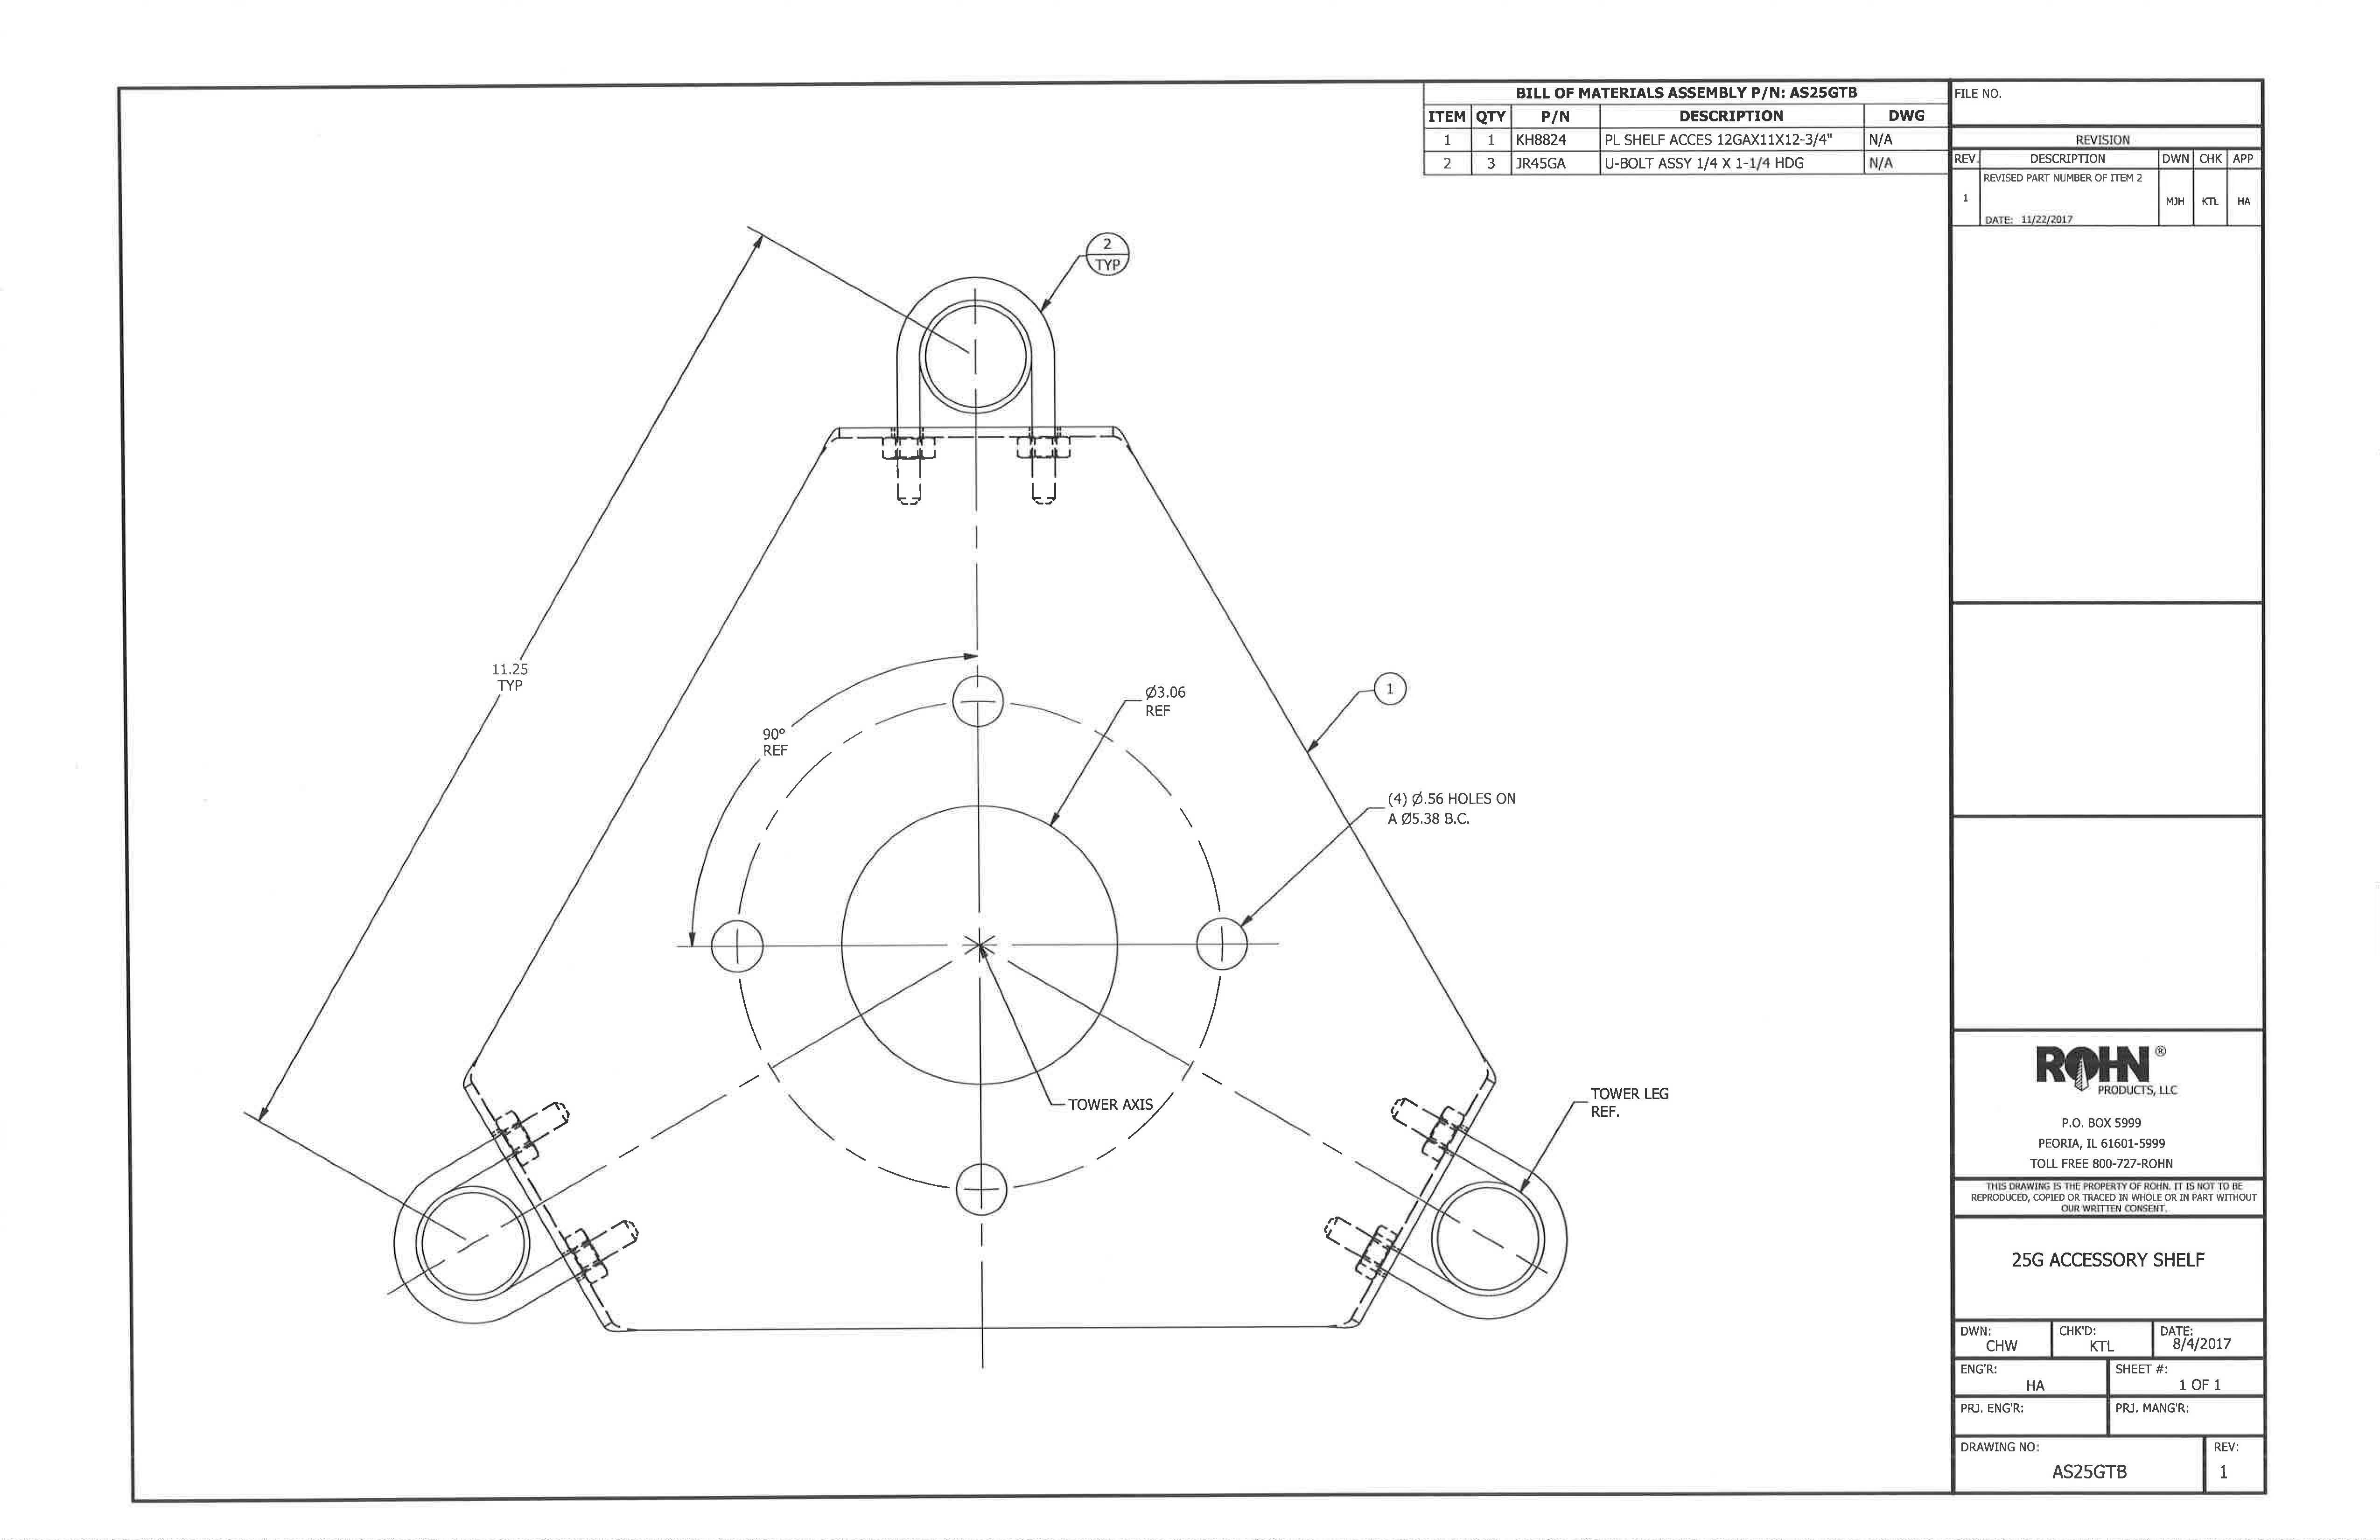 ROHN AS25GTB 25G Tower Thrust Bearing Accessory Shelf